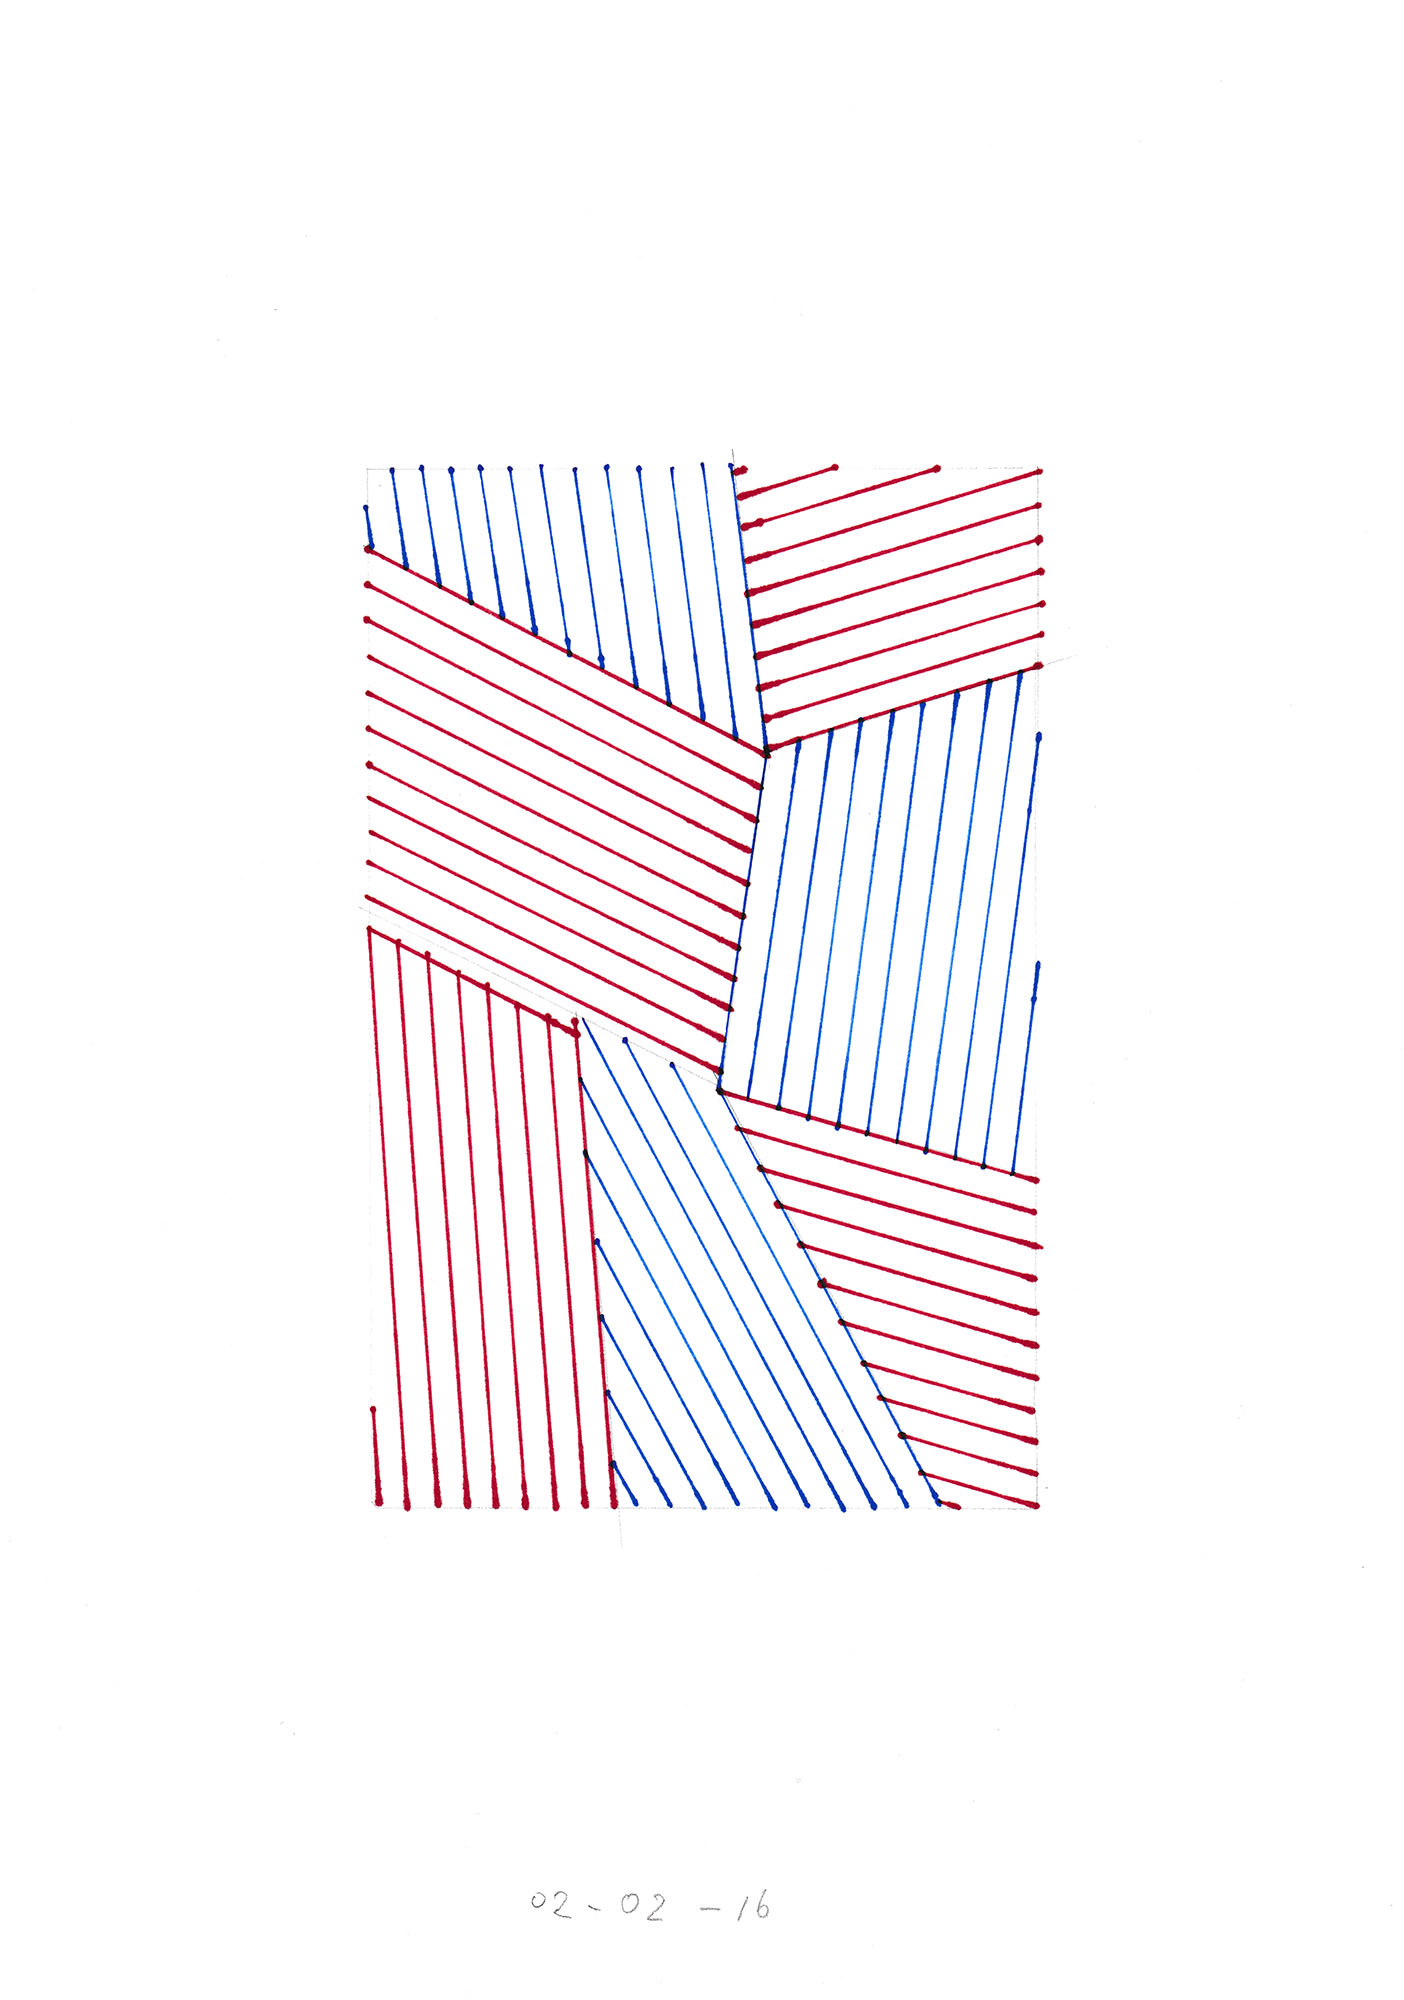 02-02-16 / permanent marker on paper / 21 x 29 cm each / 250 gs paper